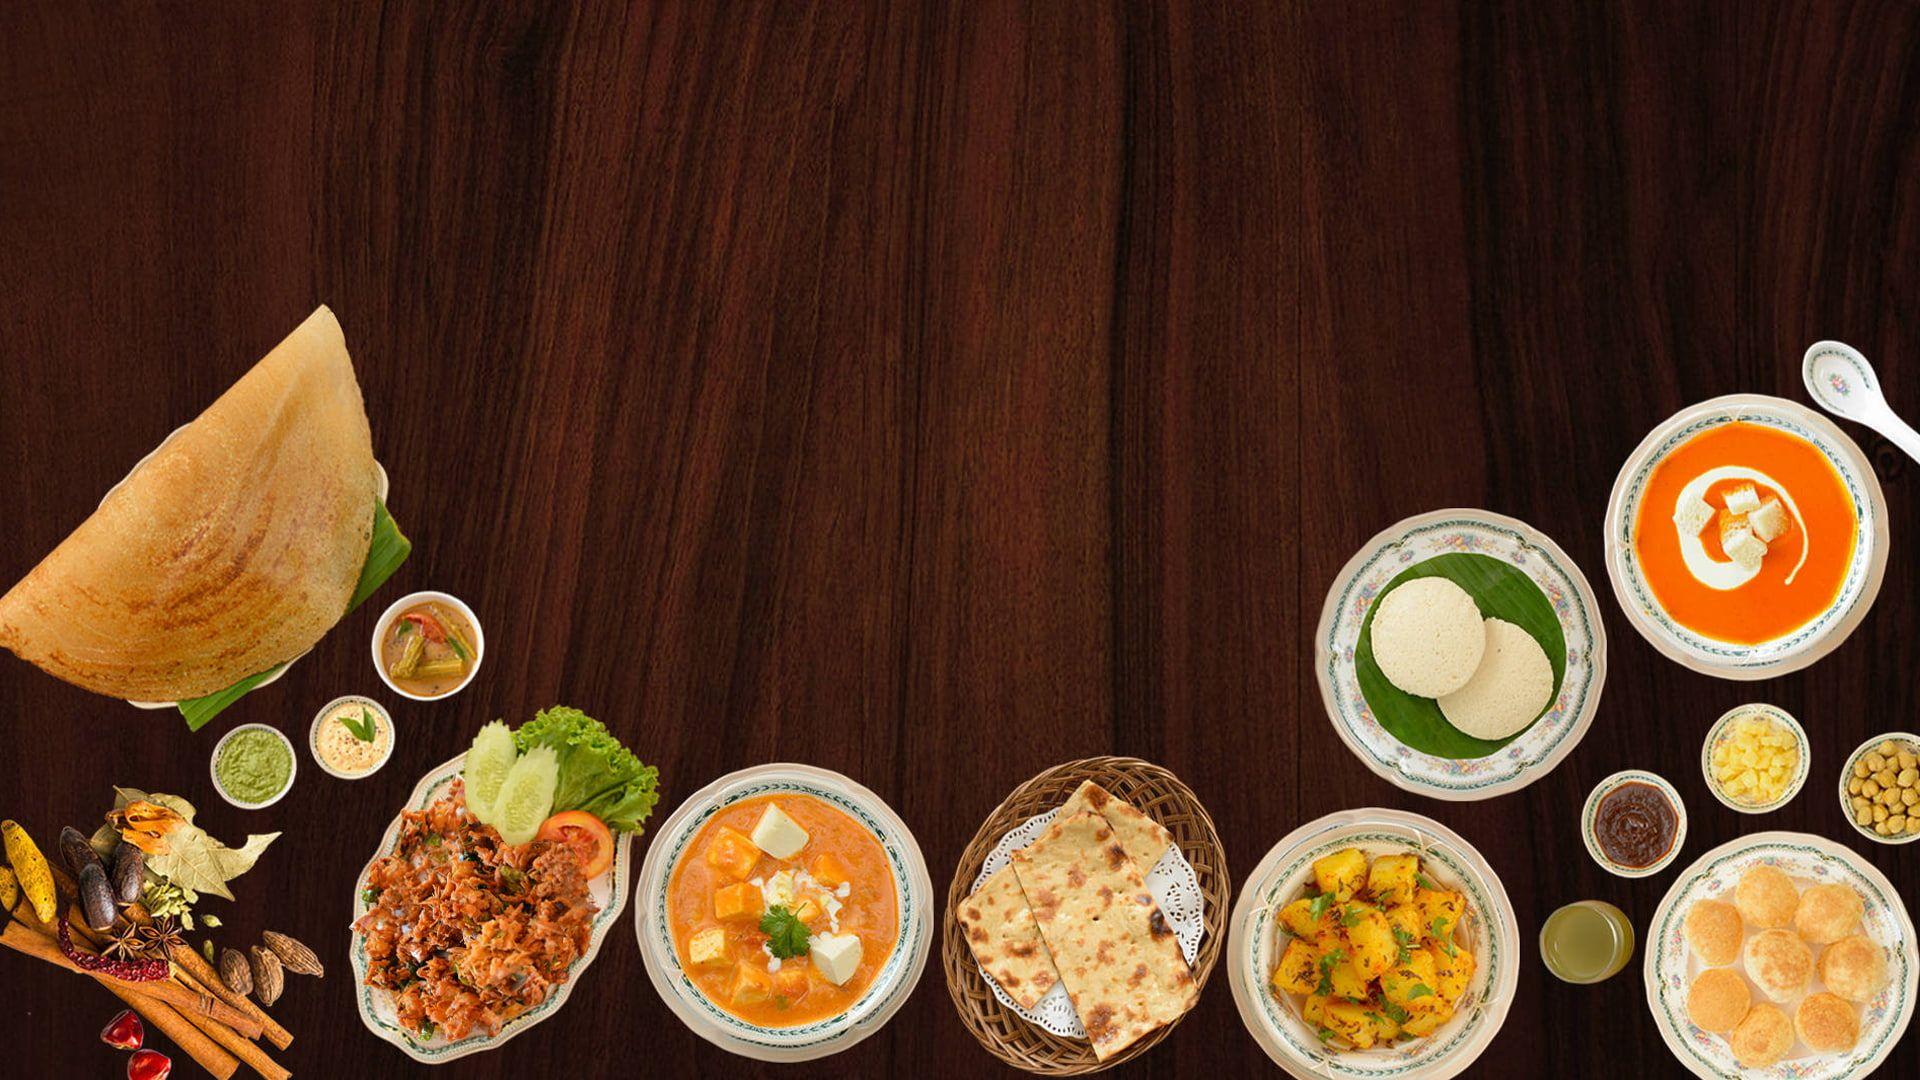 Cuisine Food India Indian Jana Mana 1080p Wallpaper Hdwallpaper Desktop Indian Food Recipes Food Food Wallpaper Food full hd wallpaper